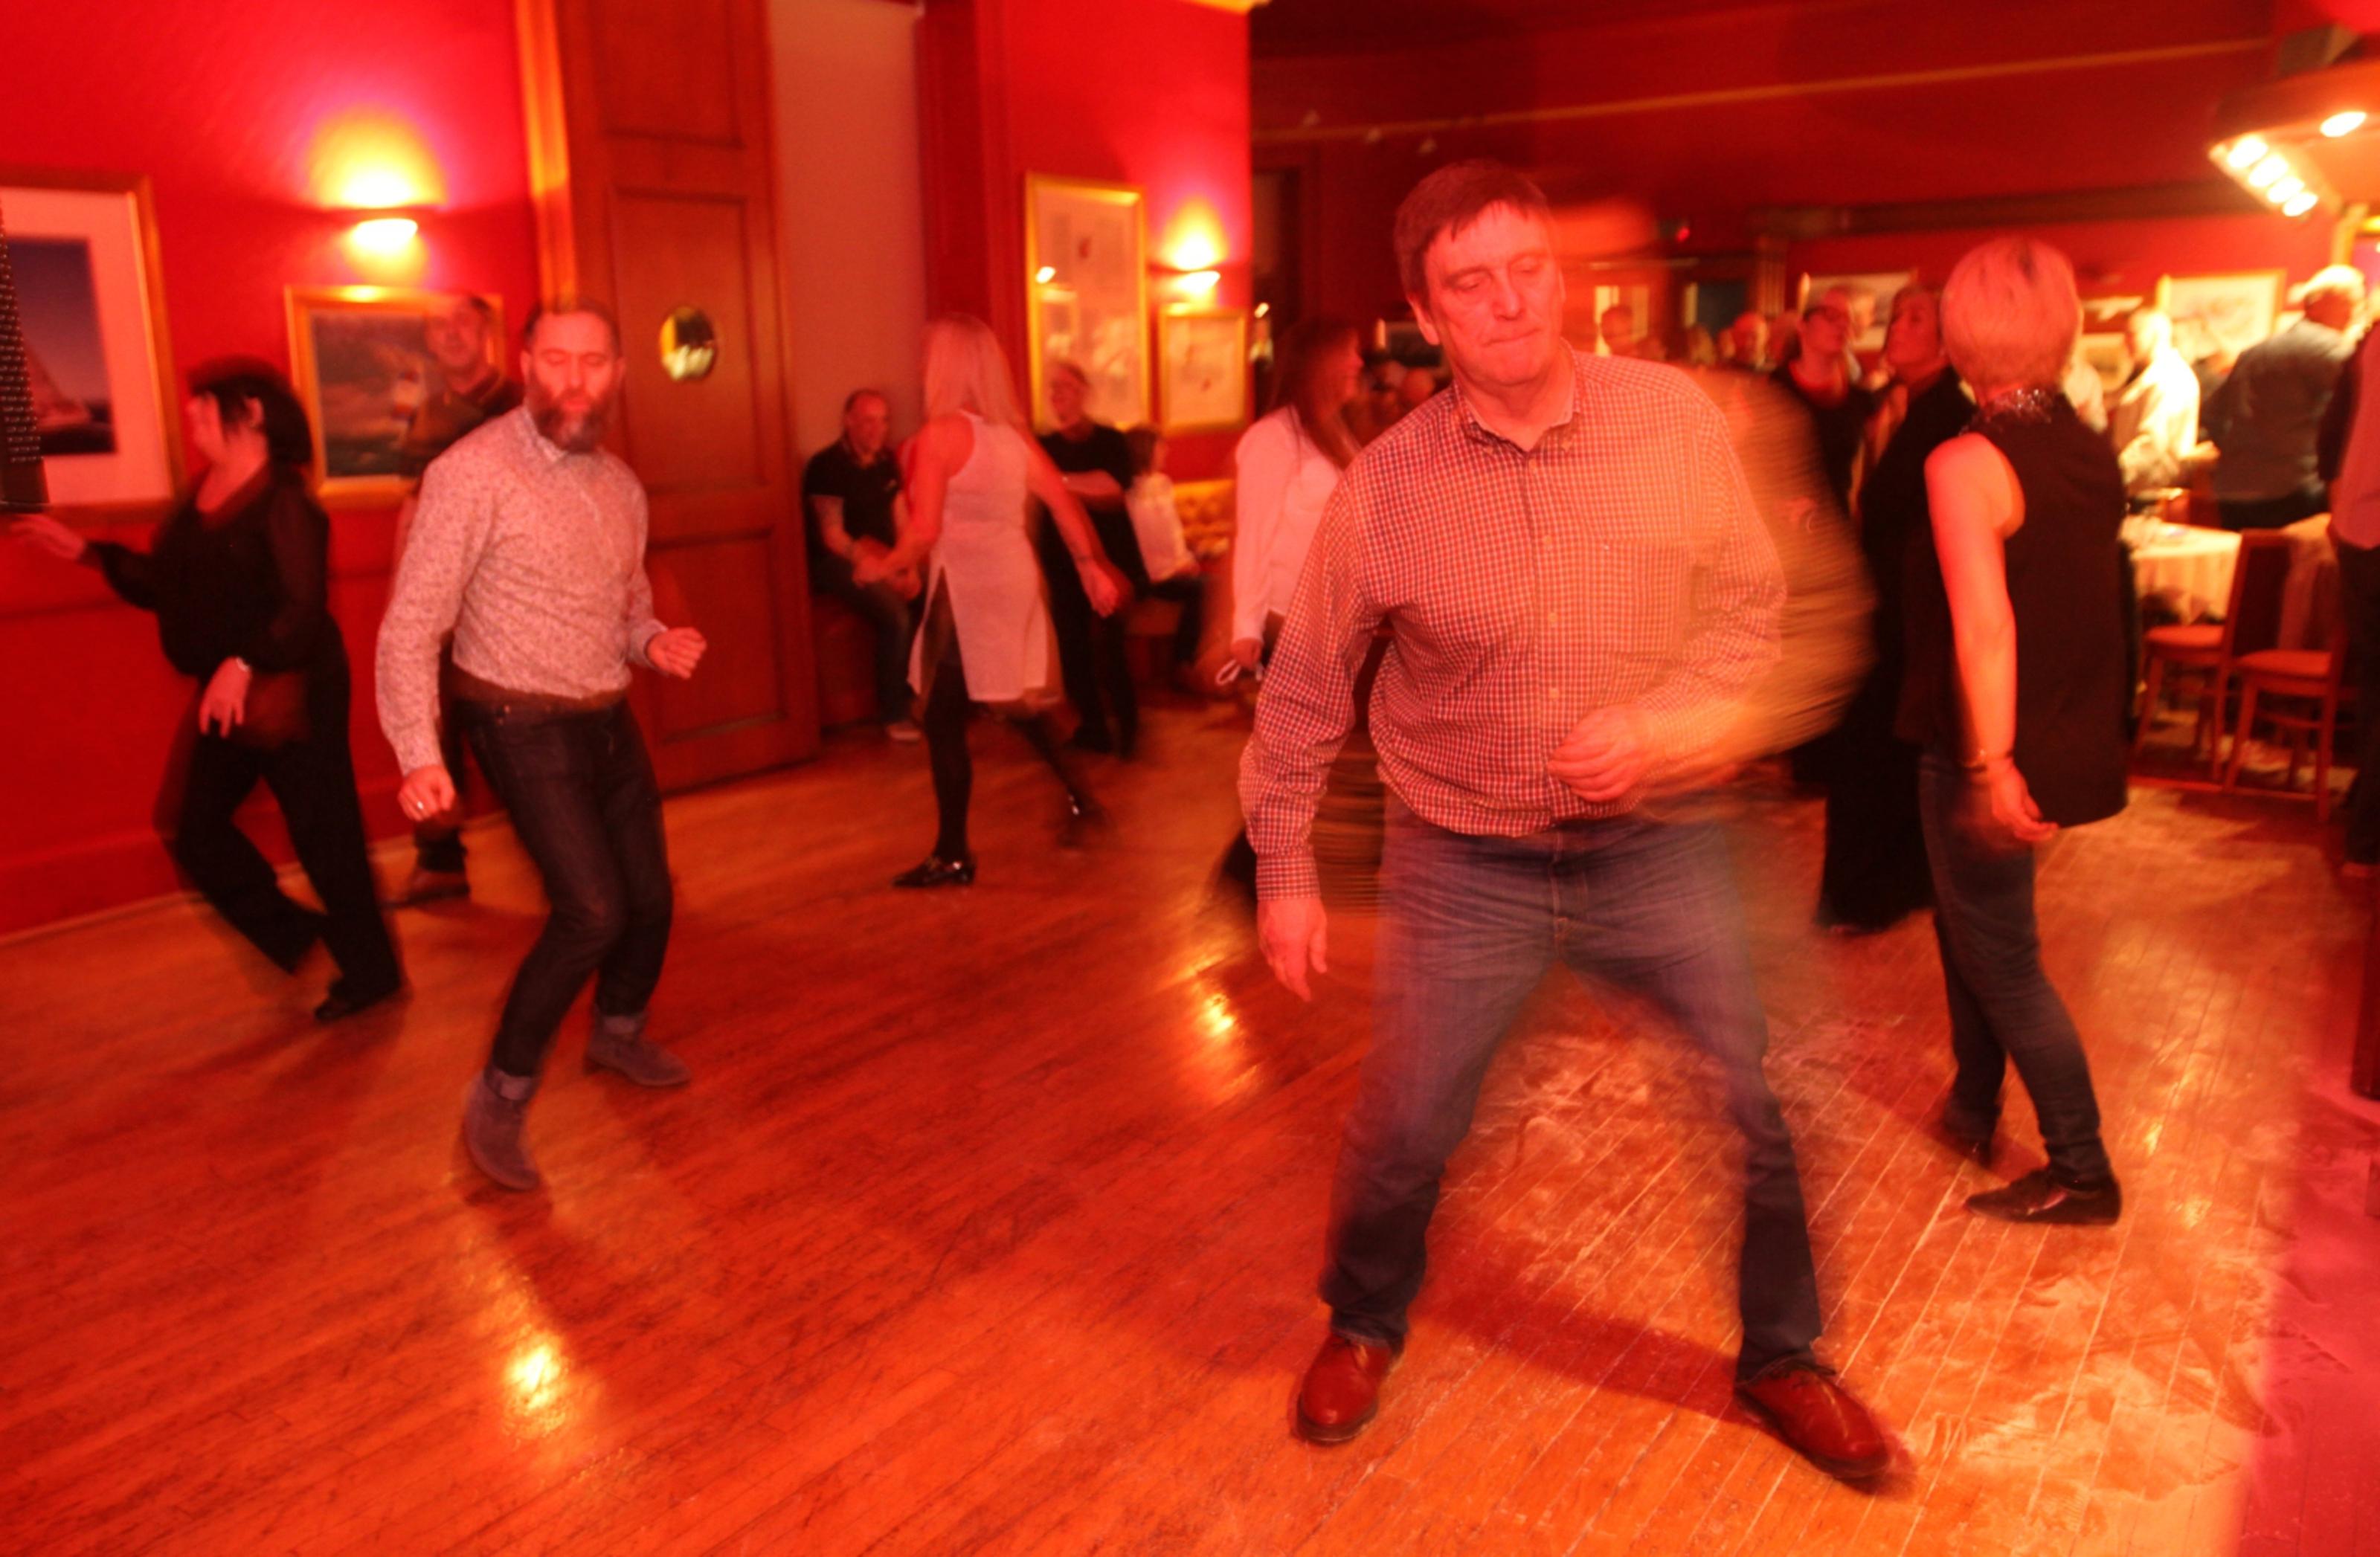 People enjoy dancing in true Northern Soul style.